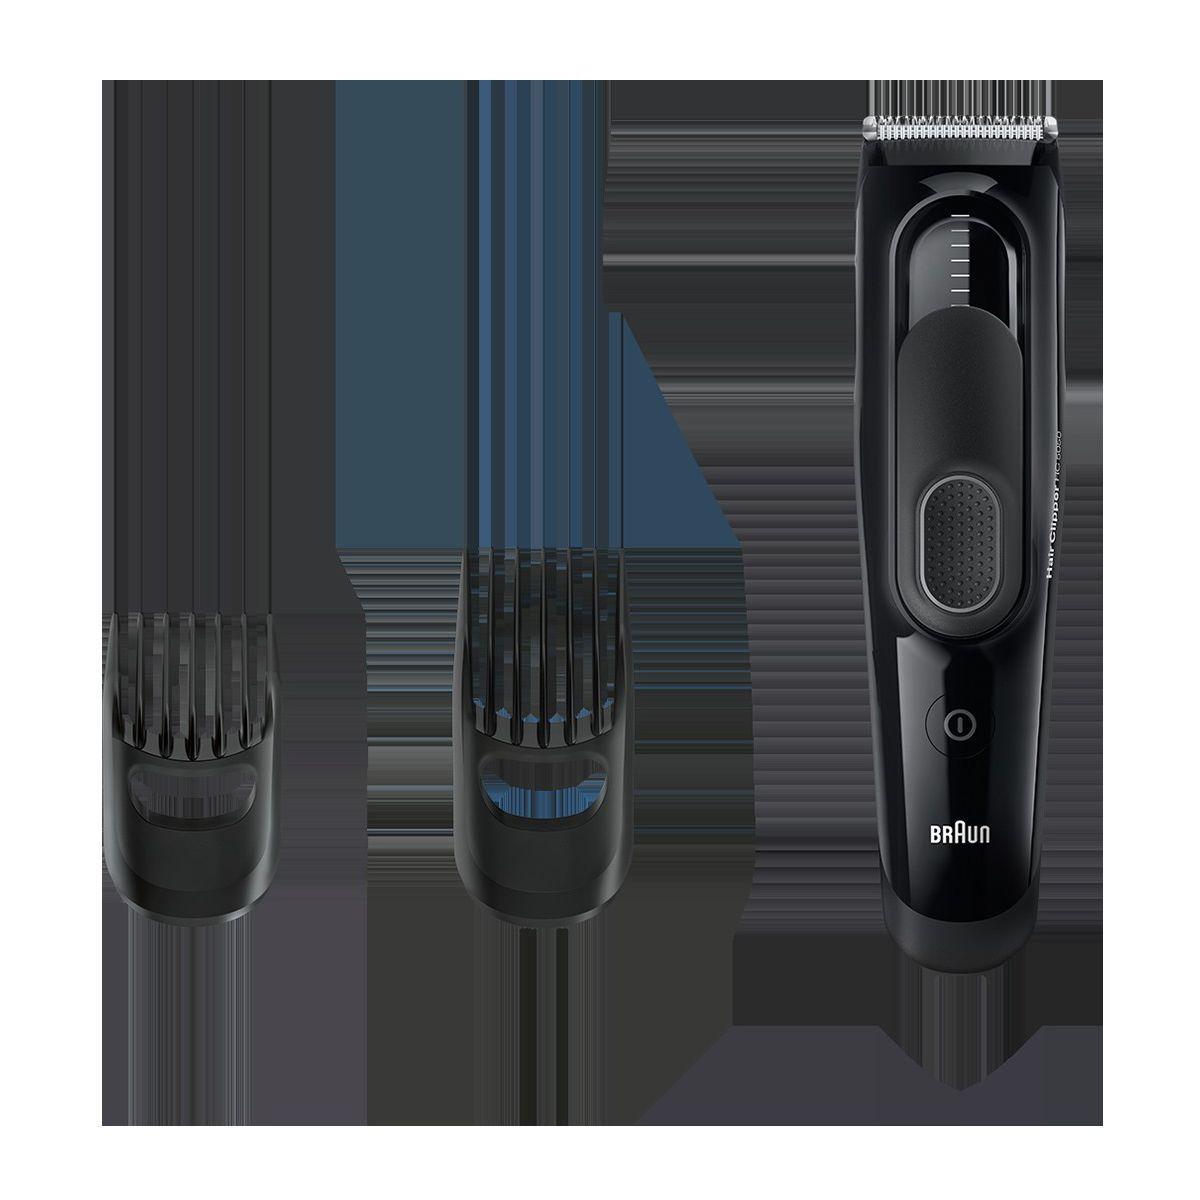 Tondeuse cheveux braun hc5050 - livraison offerte : code premi...